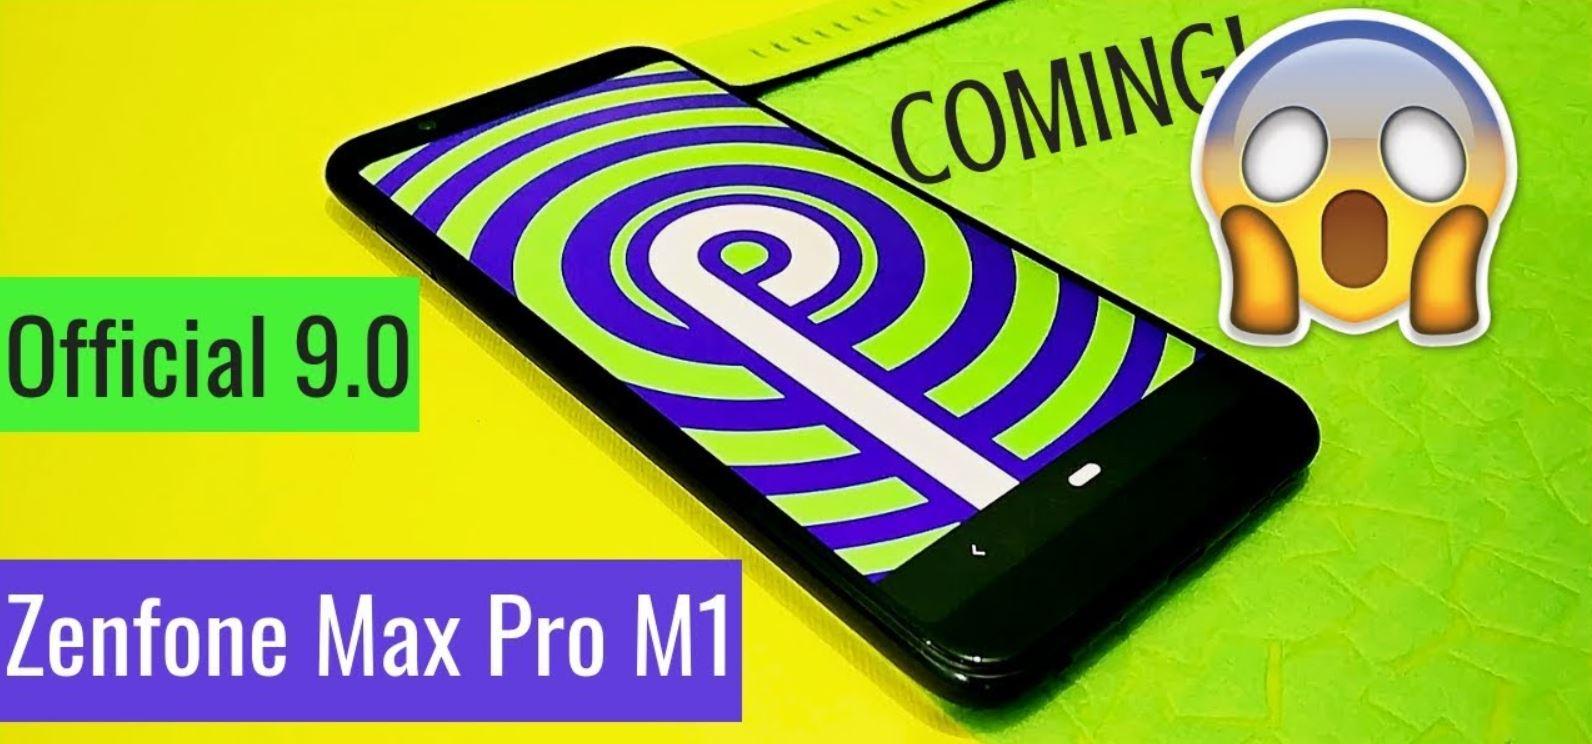 p-zenfone-max-pro-m1-jpg.5837